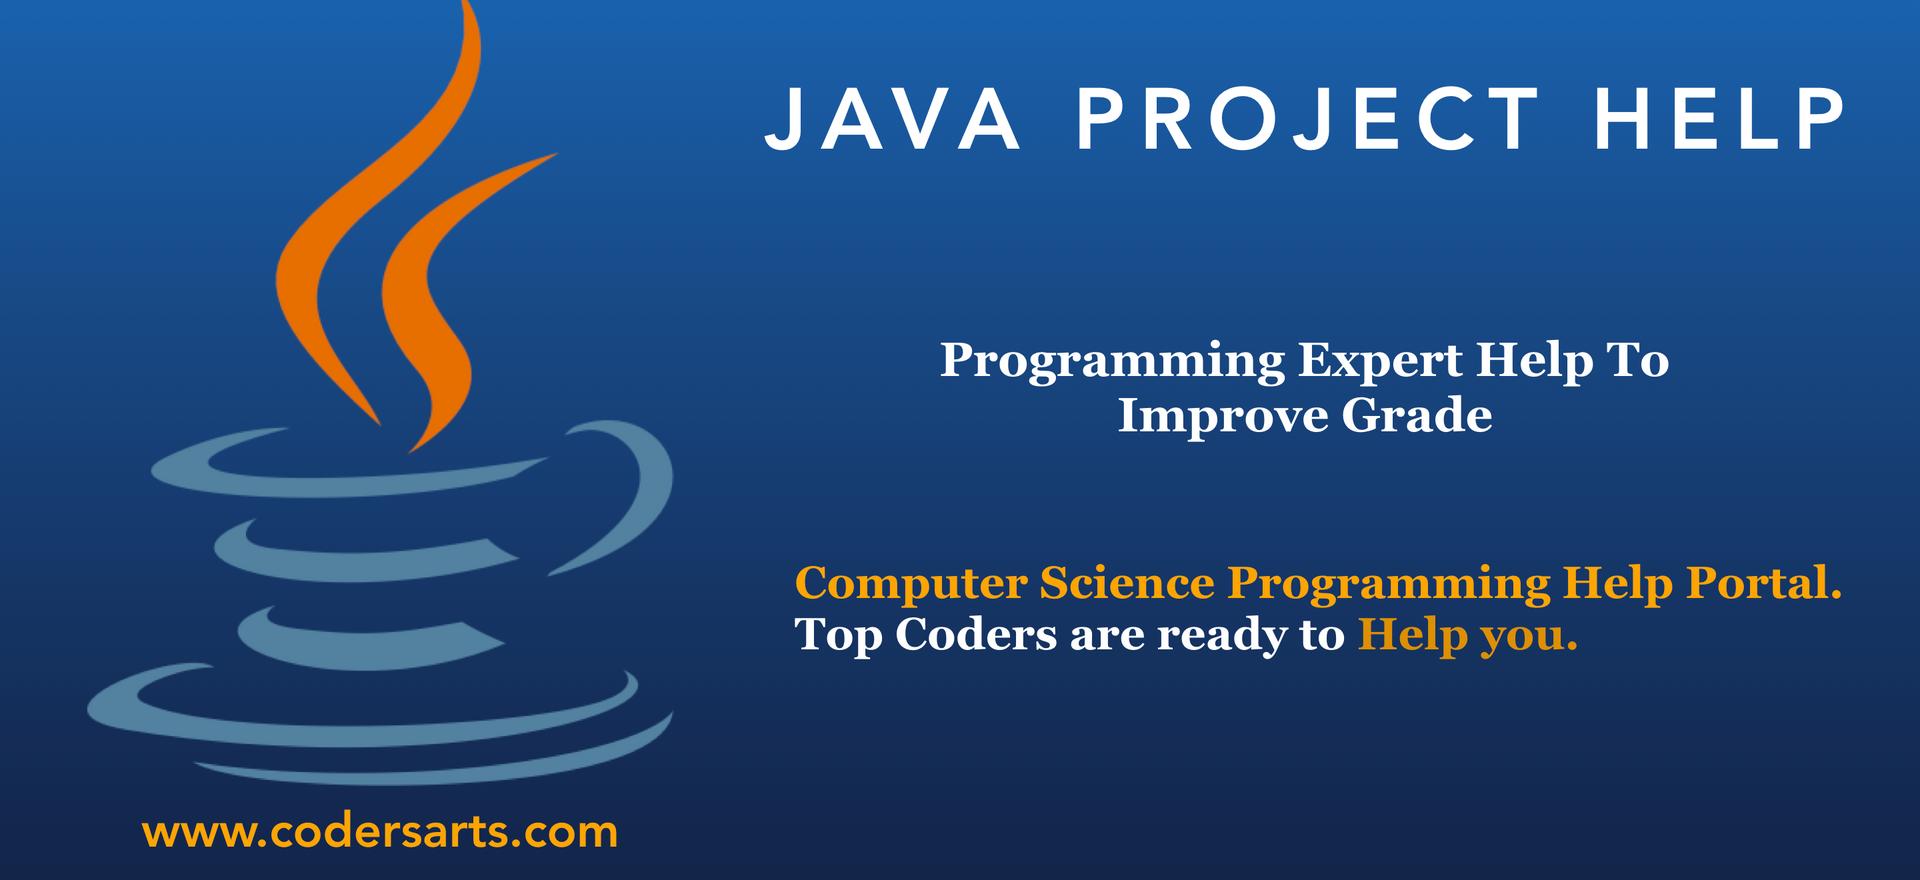 Java Project Help